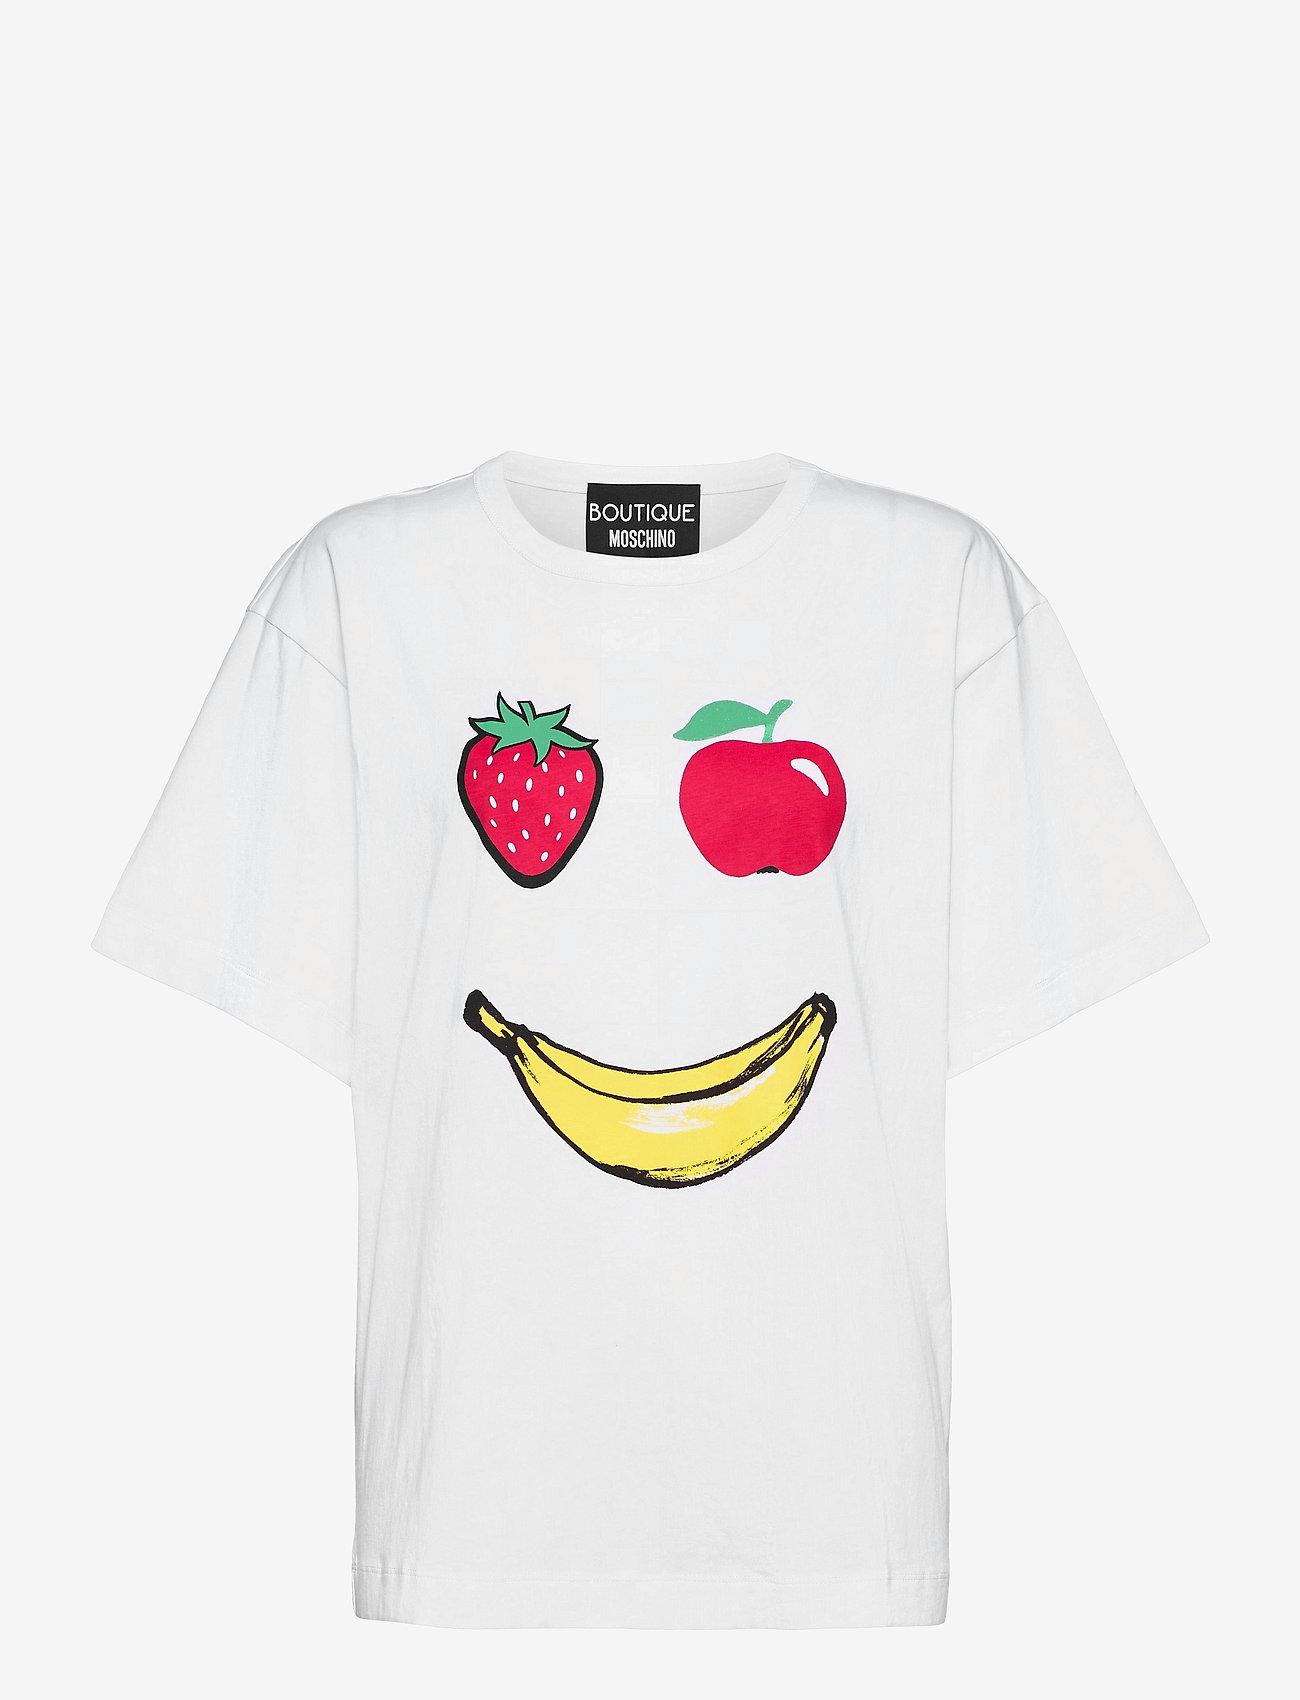 Boutique Moschino - APPLES T-SHIRT - t-shirts - white fantasy print - 0